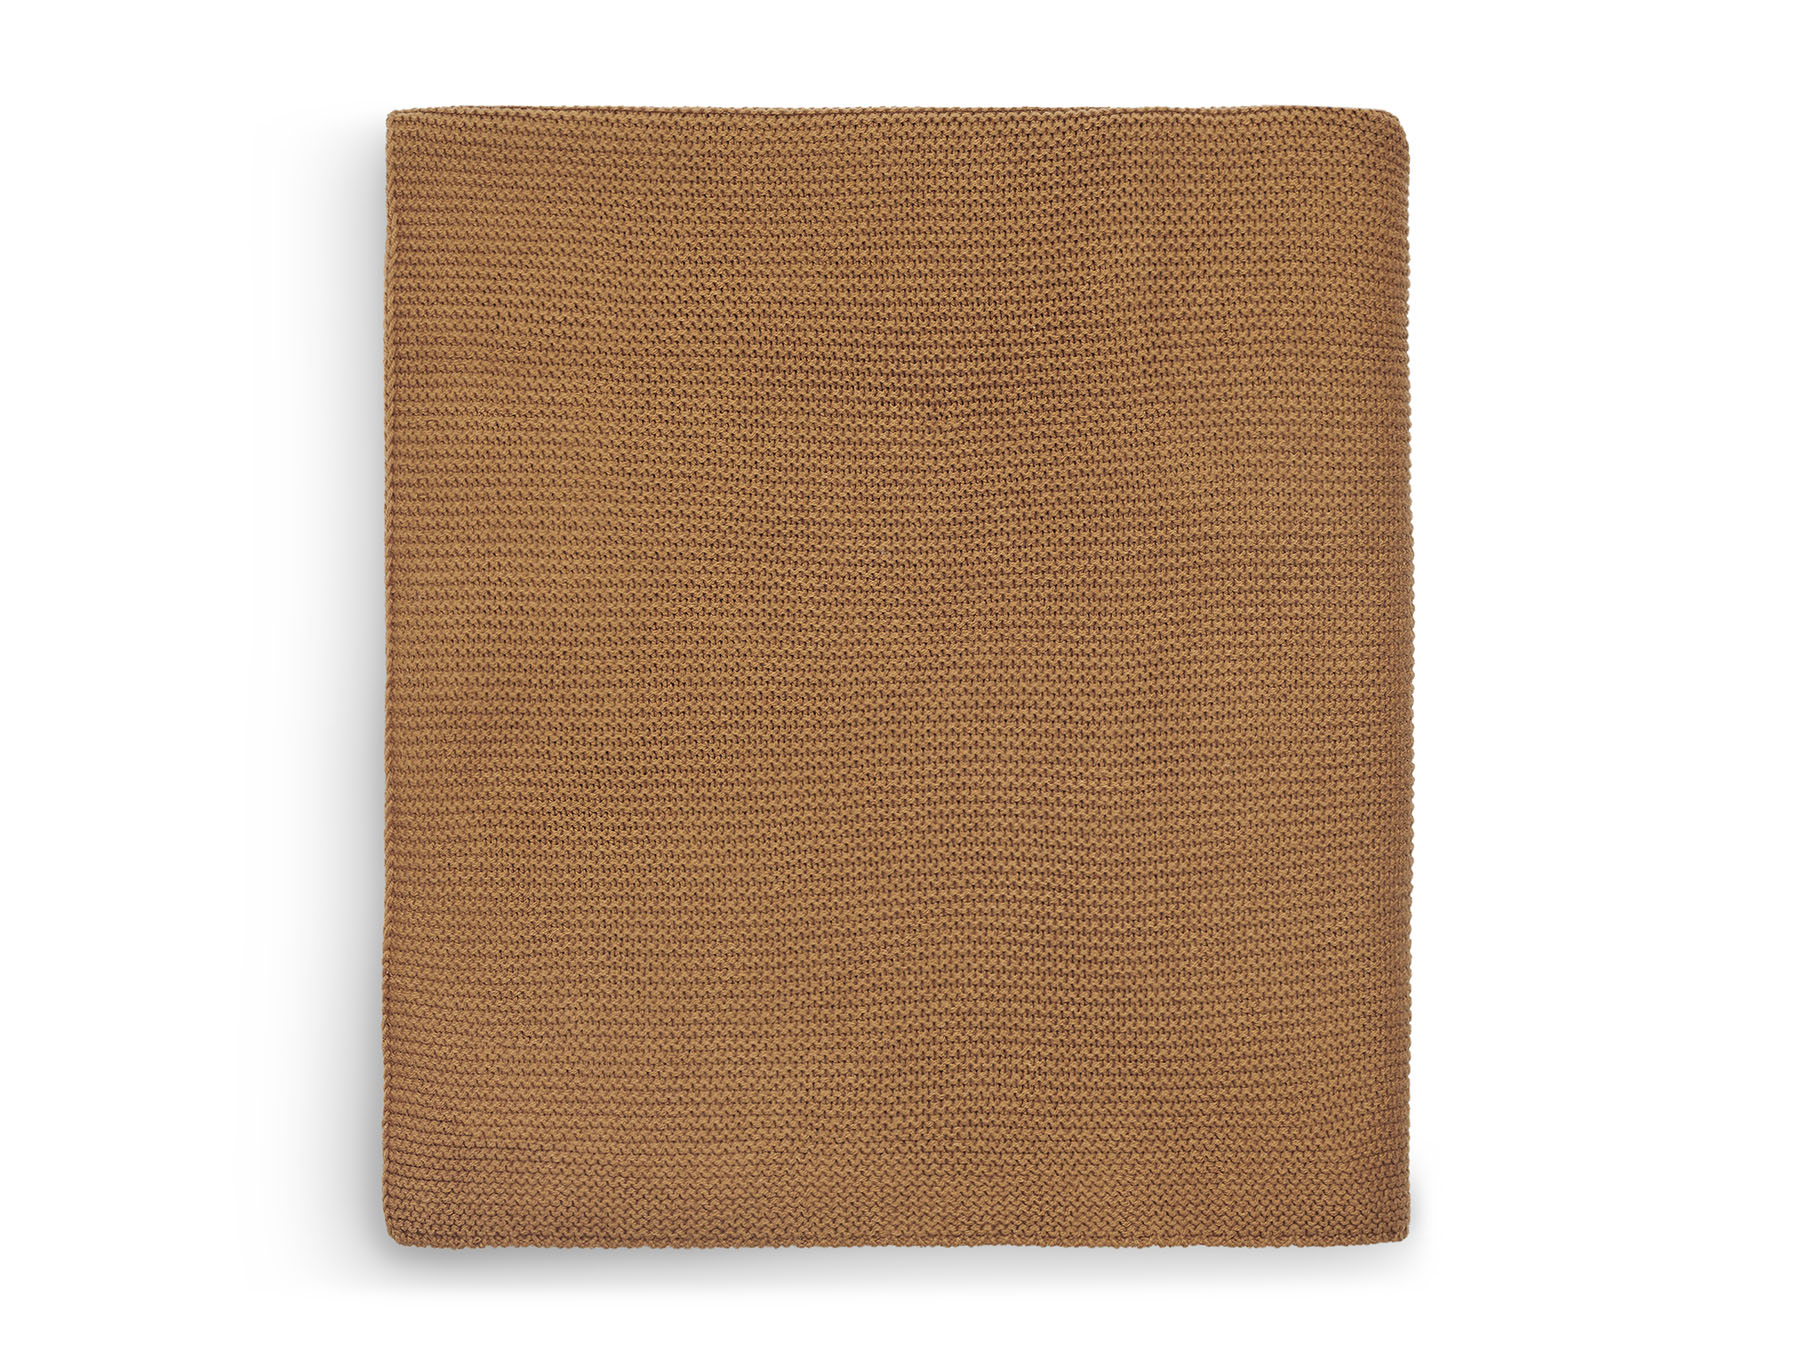 Babydecke Strickdecke Basic knit Karamell rostbraun (Gr. 75x100 cm)